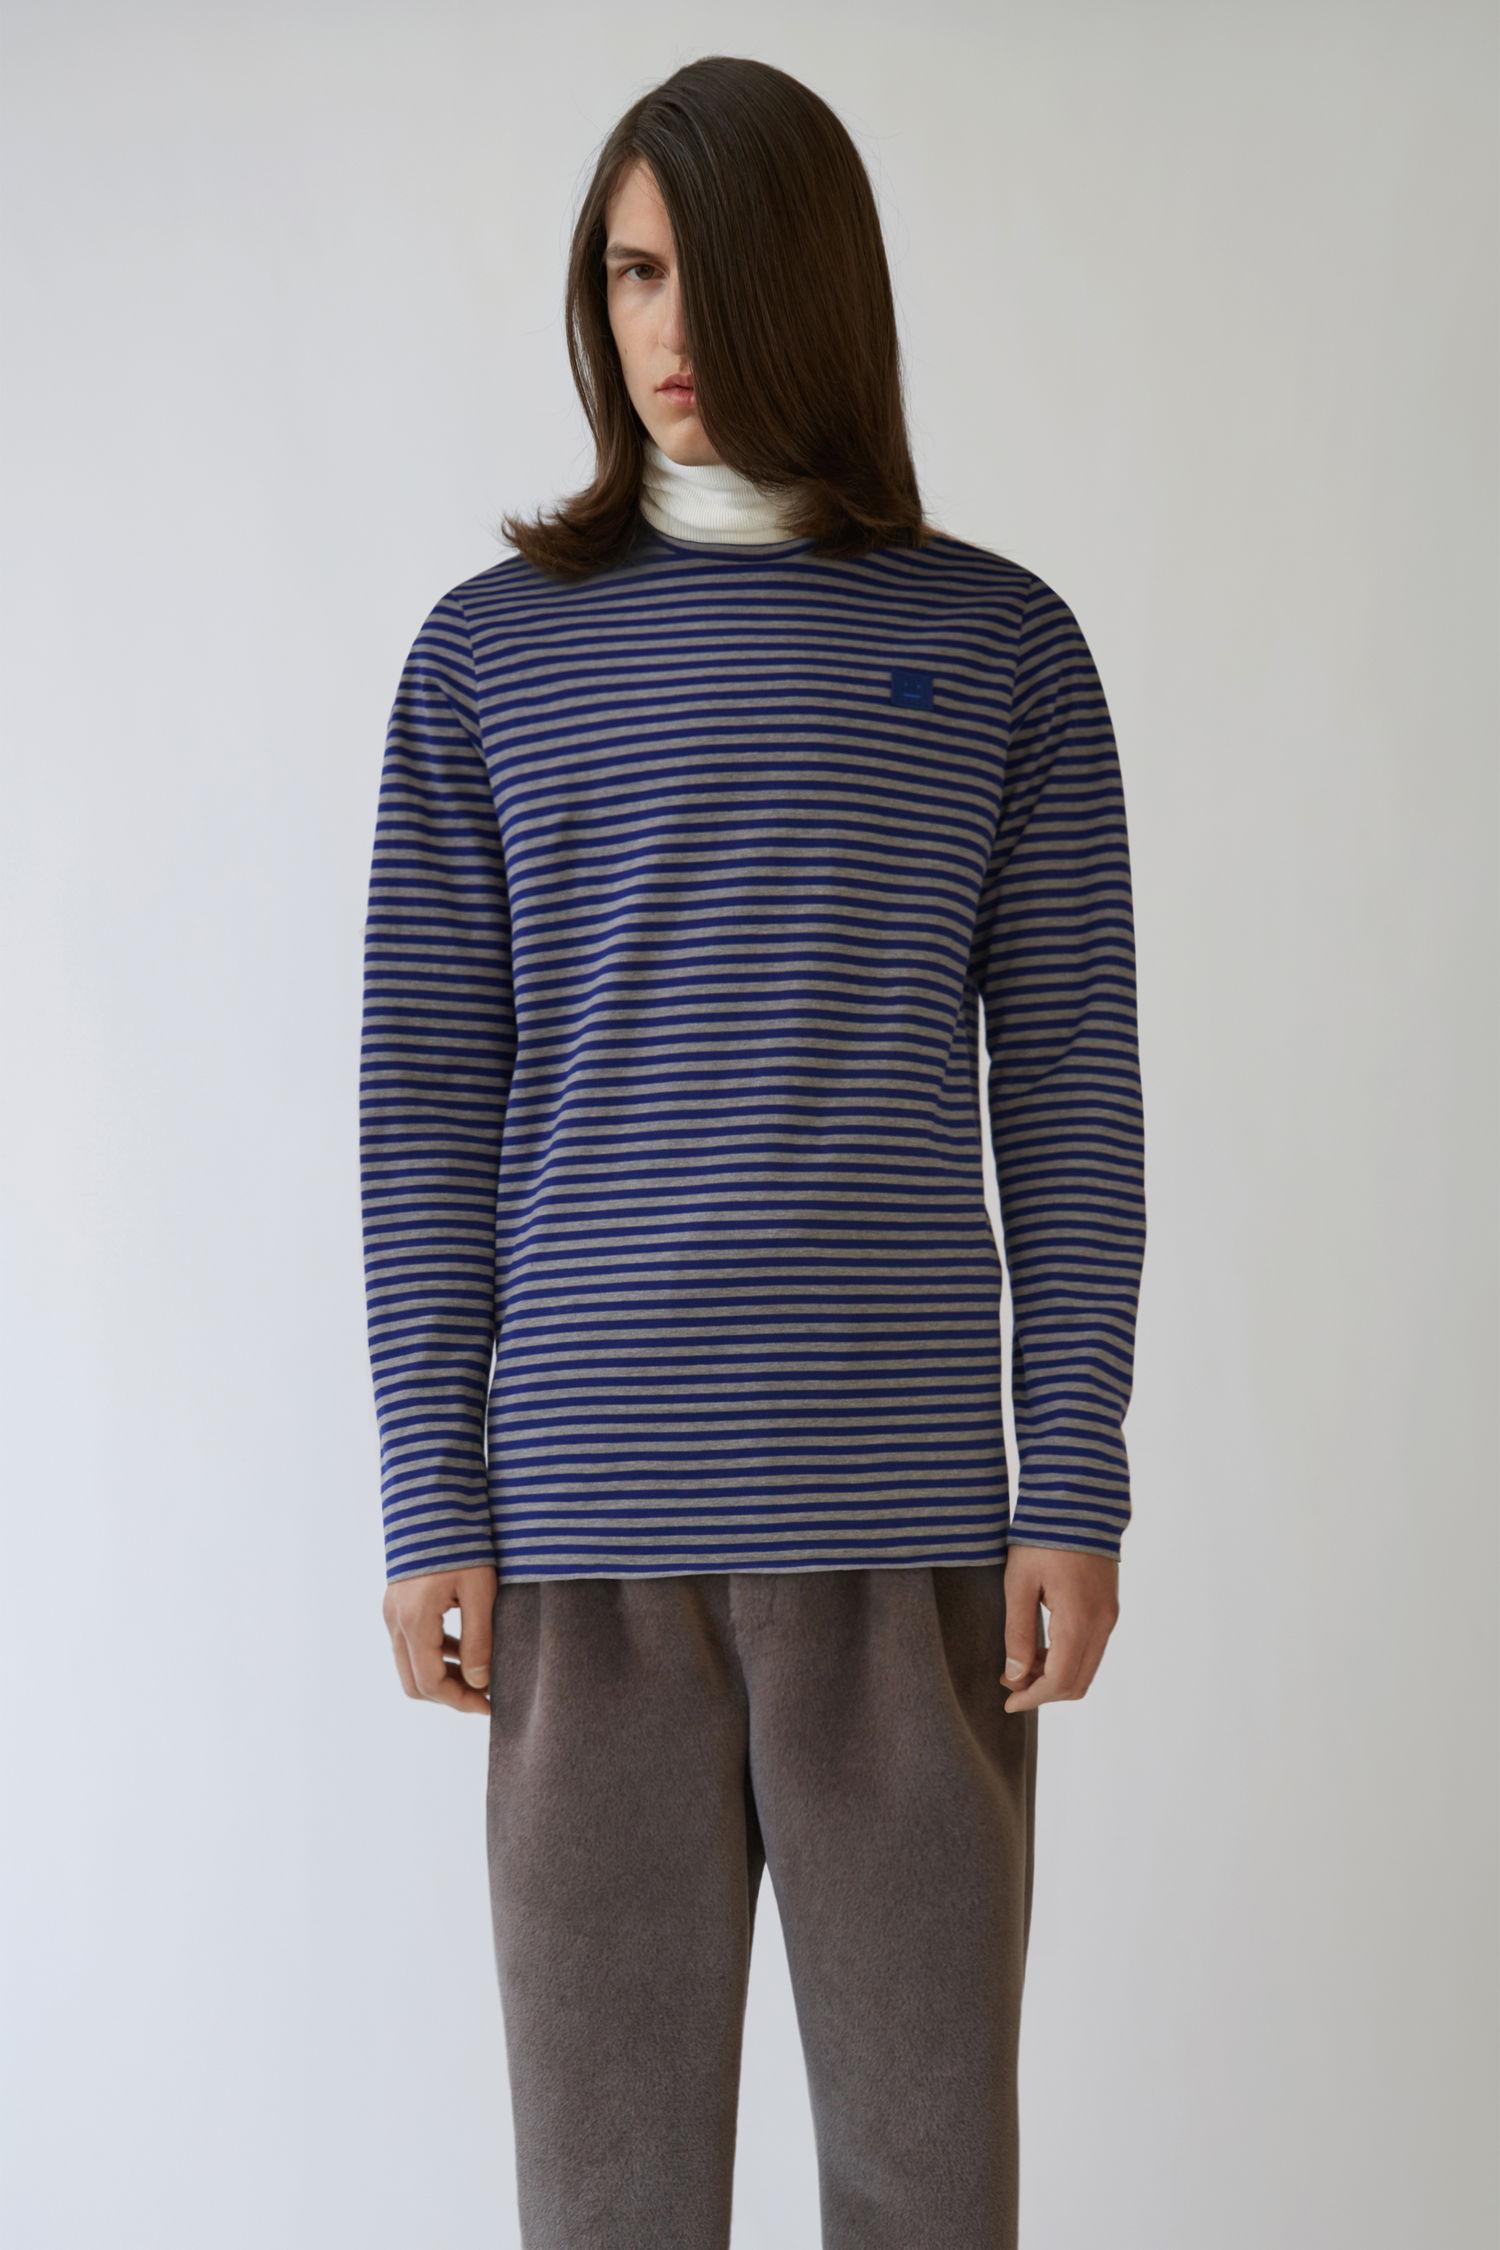 Acne Studios Slim Fit T-shirt Lt Grey Melange / Royal Blue